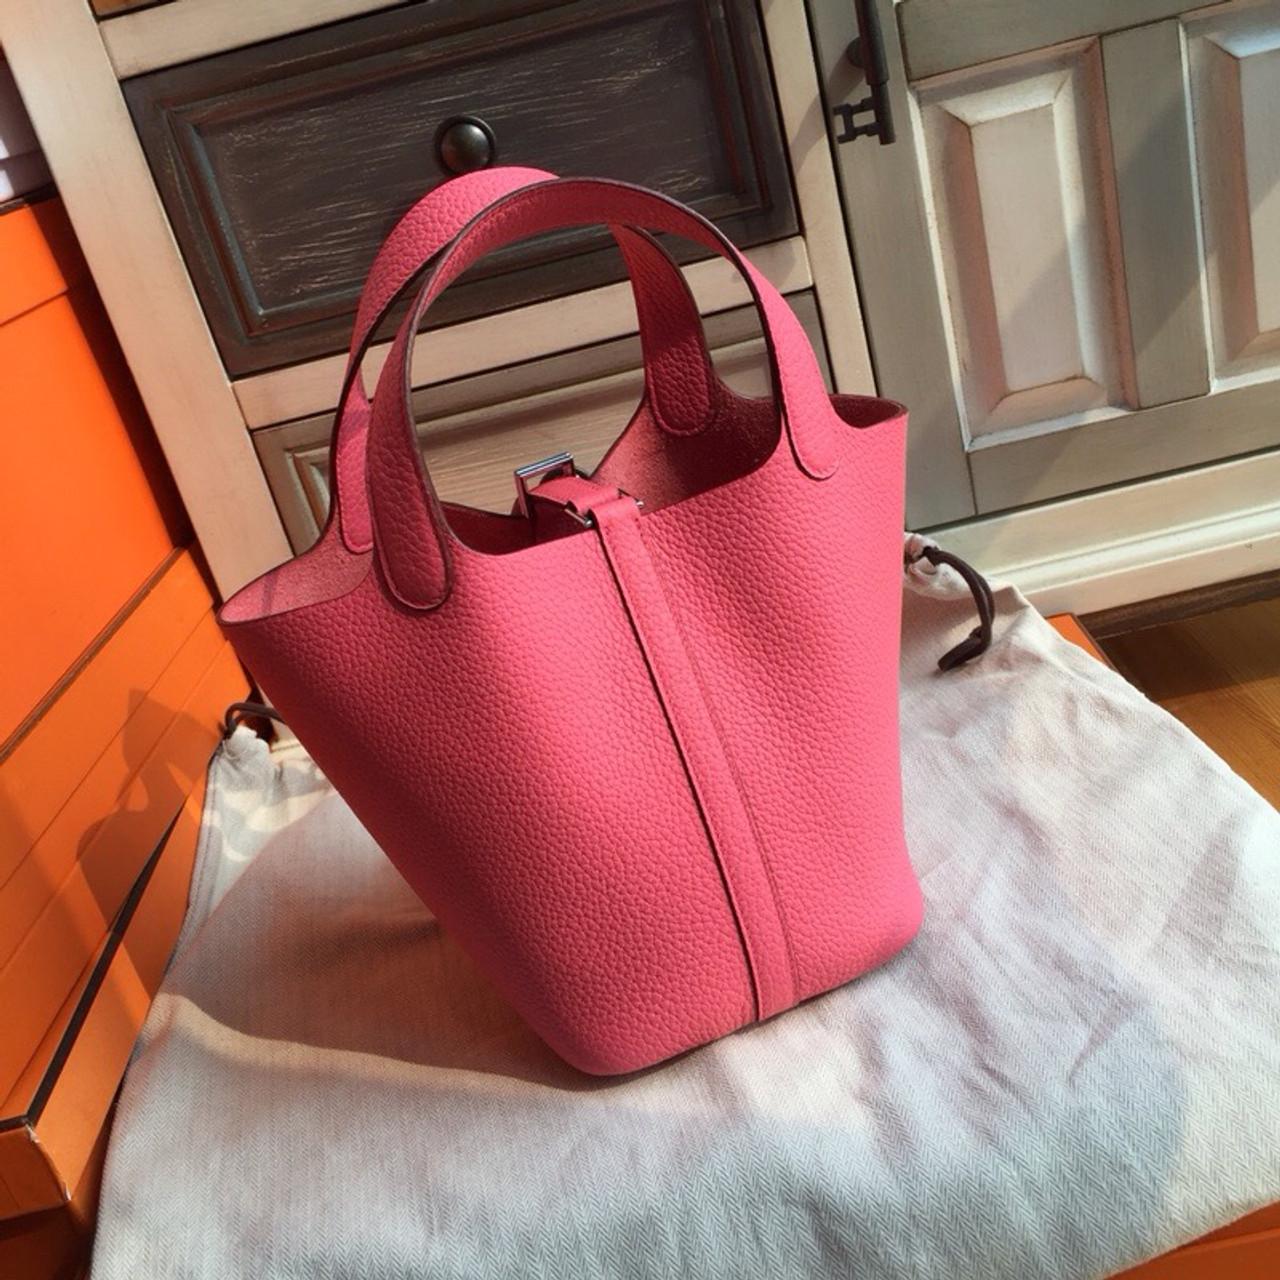 887ad2da8777 Hermes 8W Rose Azalee Picotin Lock 18 Togo Leather Bag - Bella Vita Moda